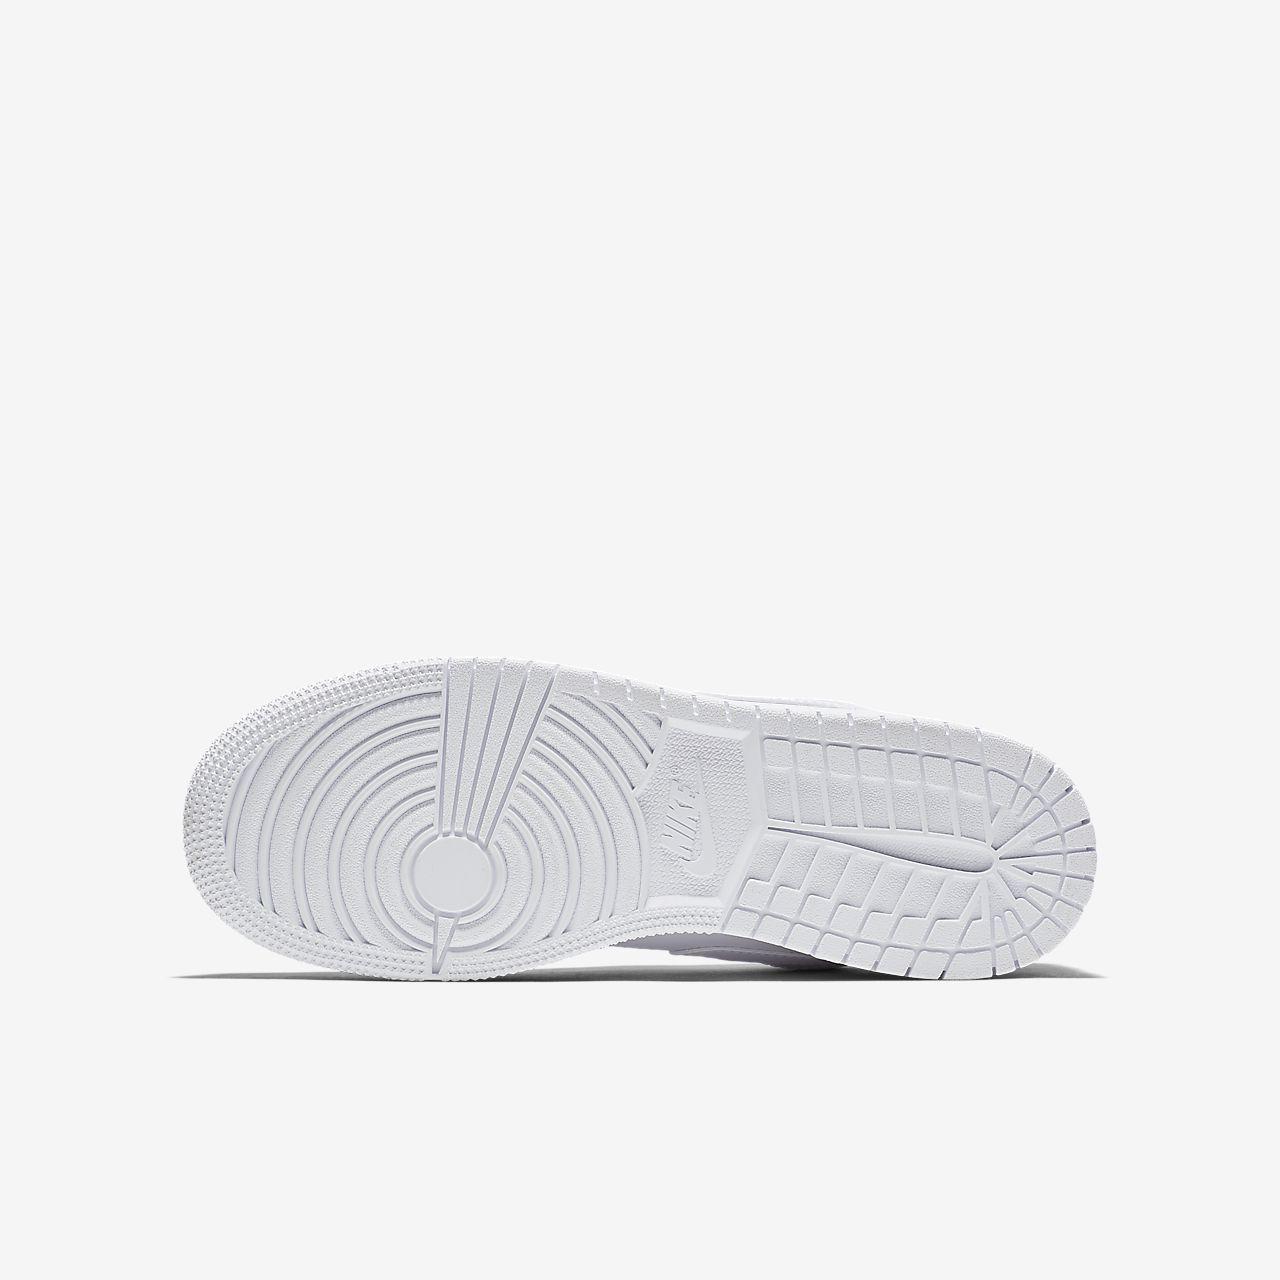 e6dbf30f7002 Air Jordan 1 Low Older Kids  Shoe. Nike.com GB